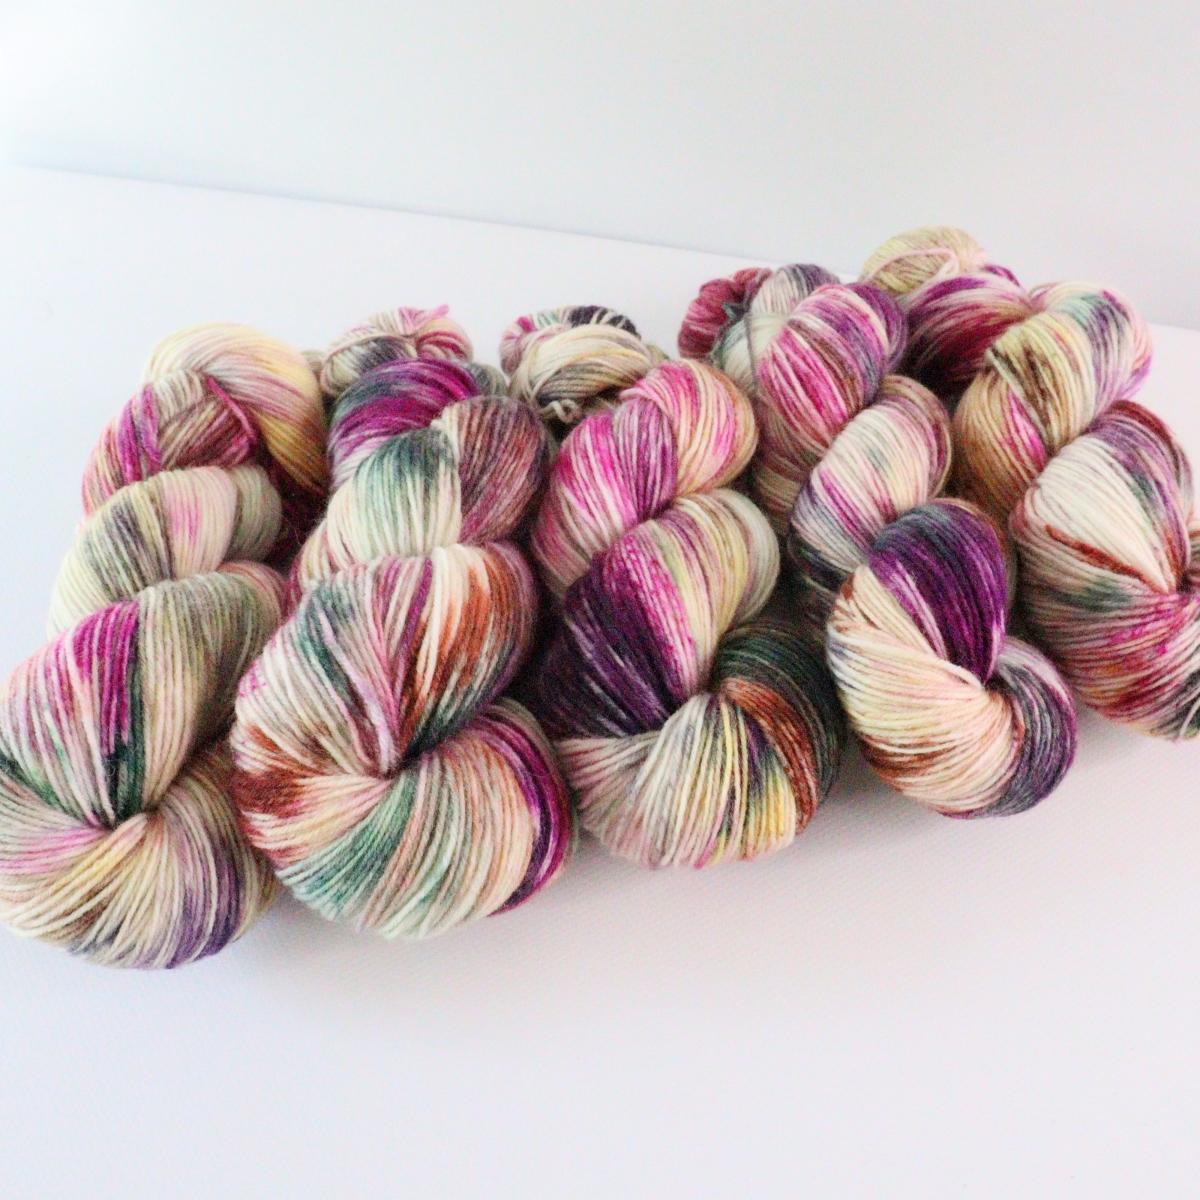 woodico.pro hand dyed yarn 070 4 1200x1200 - Hand dyed yarn / 070